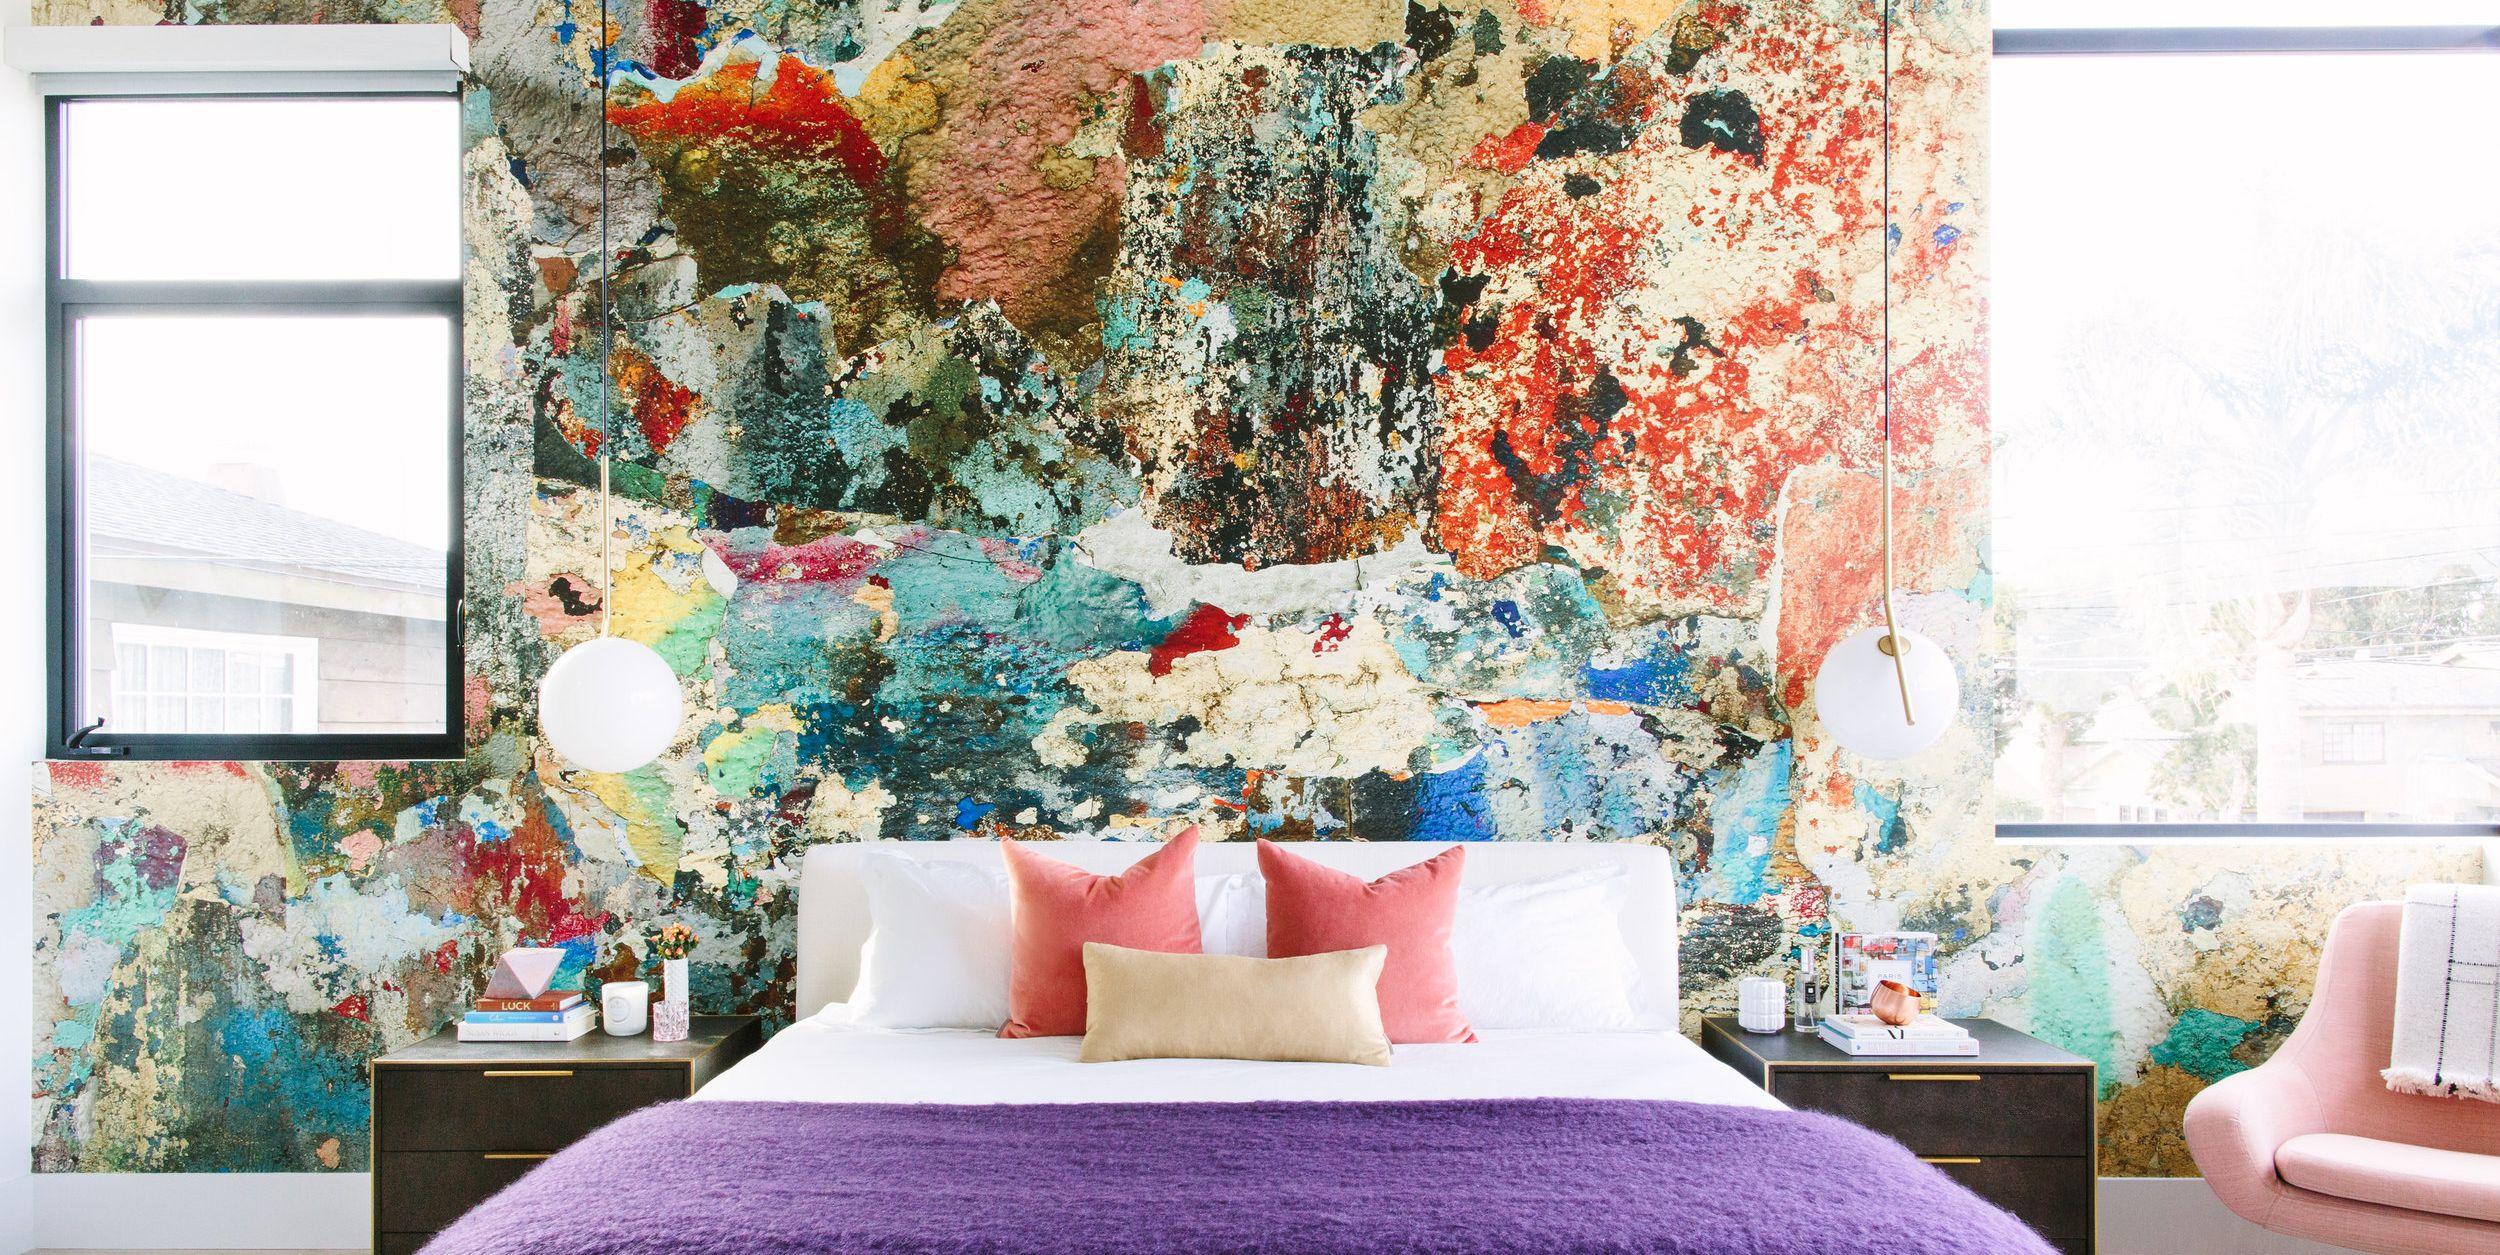 12 Crazy-Fun Ways To Dress Up Your Bedroom Walls